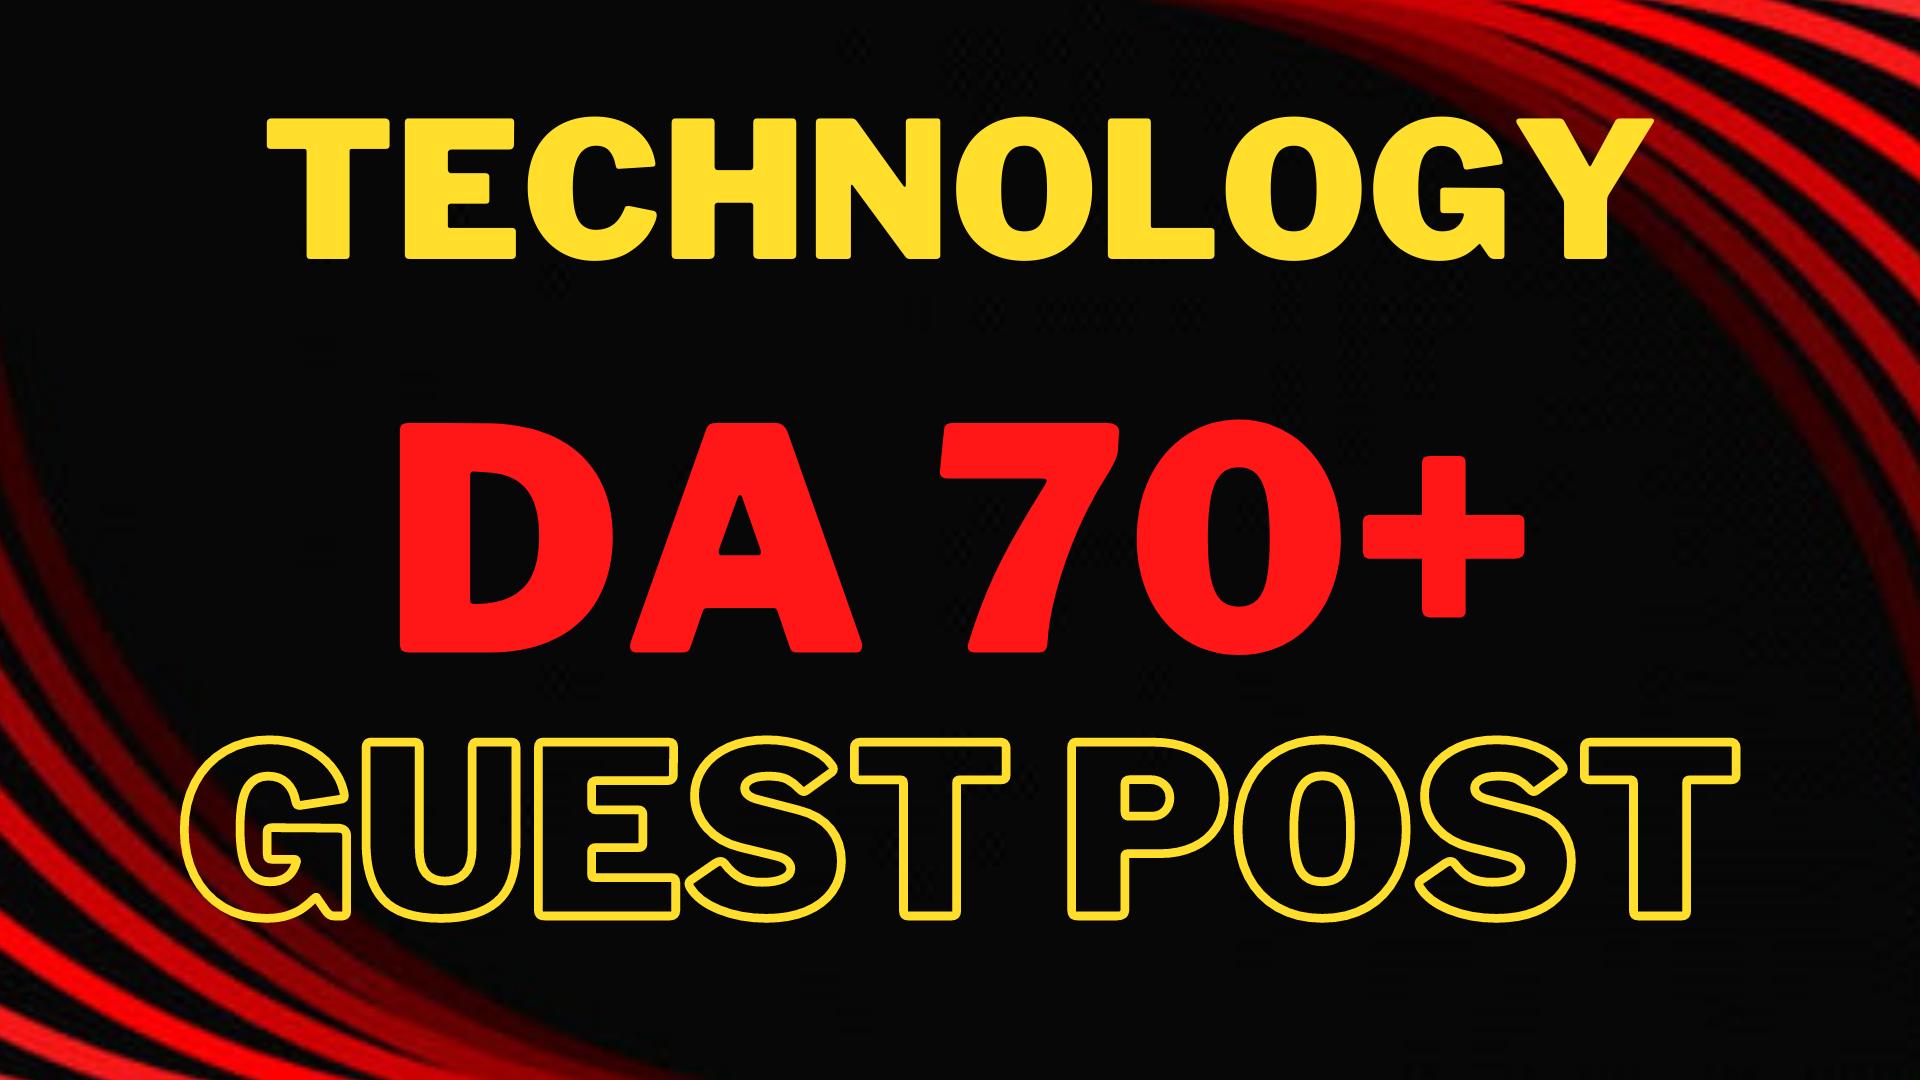 I'll make High DA 60 guest post on Technology for improve seo ranking.